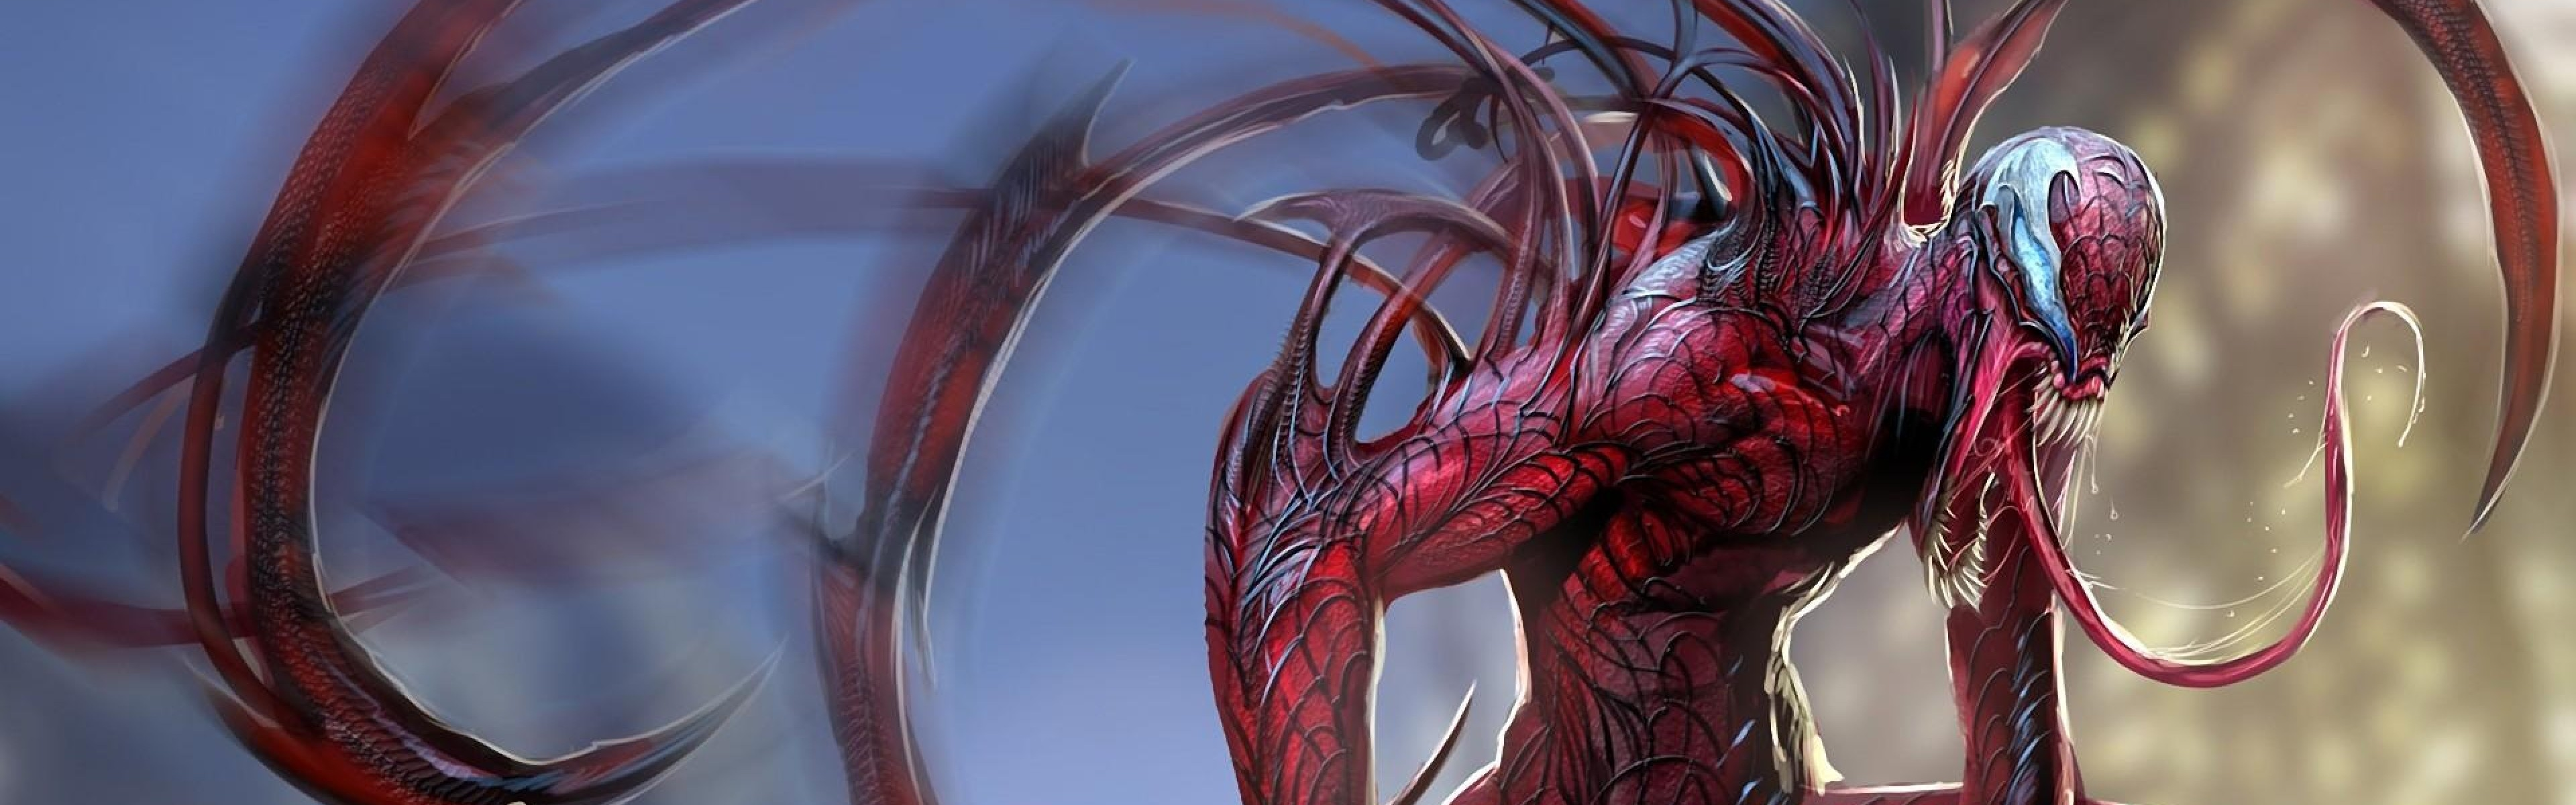 Wallpaper carnage, spider man, language, monster